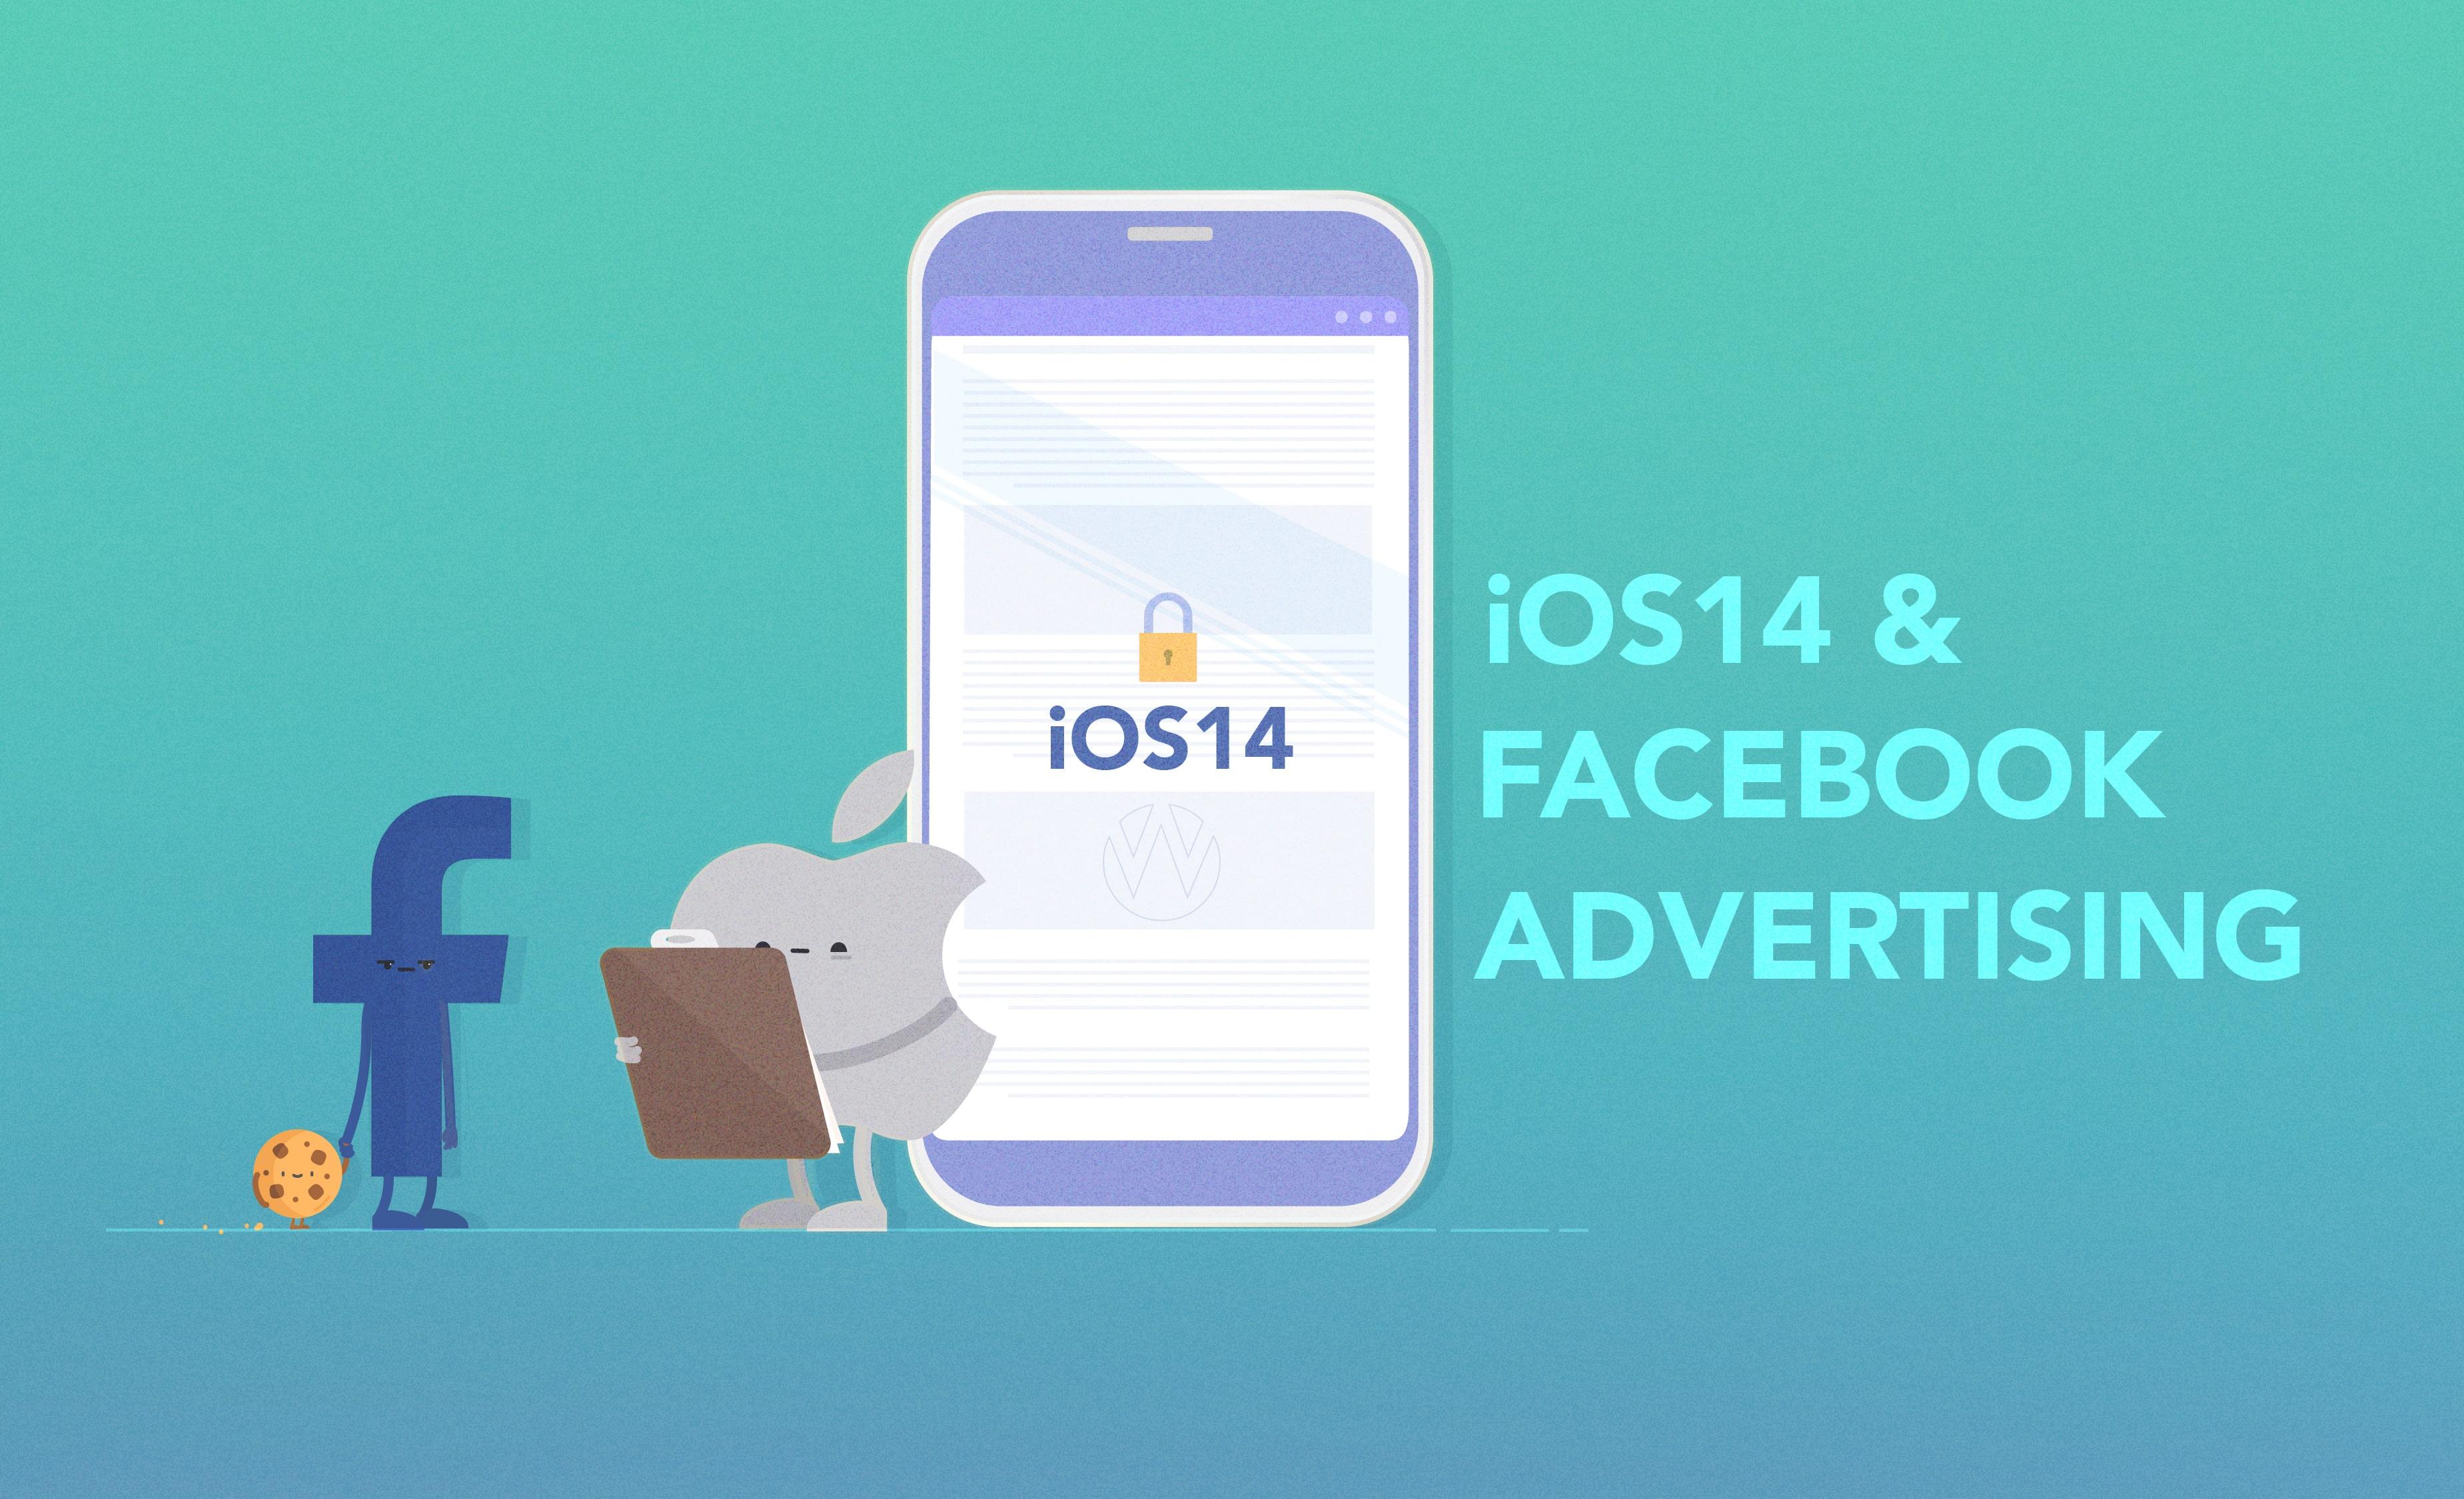 iOS14 & Facebook Advertising